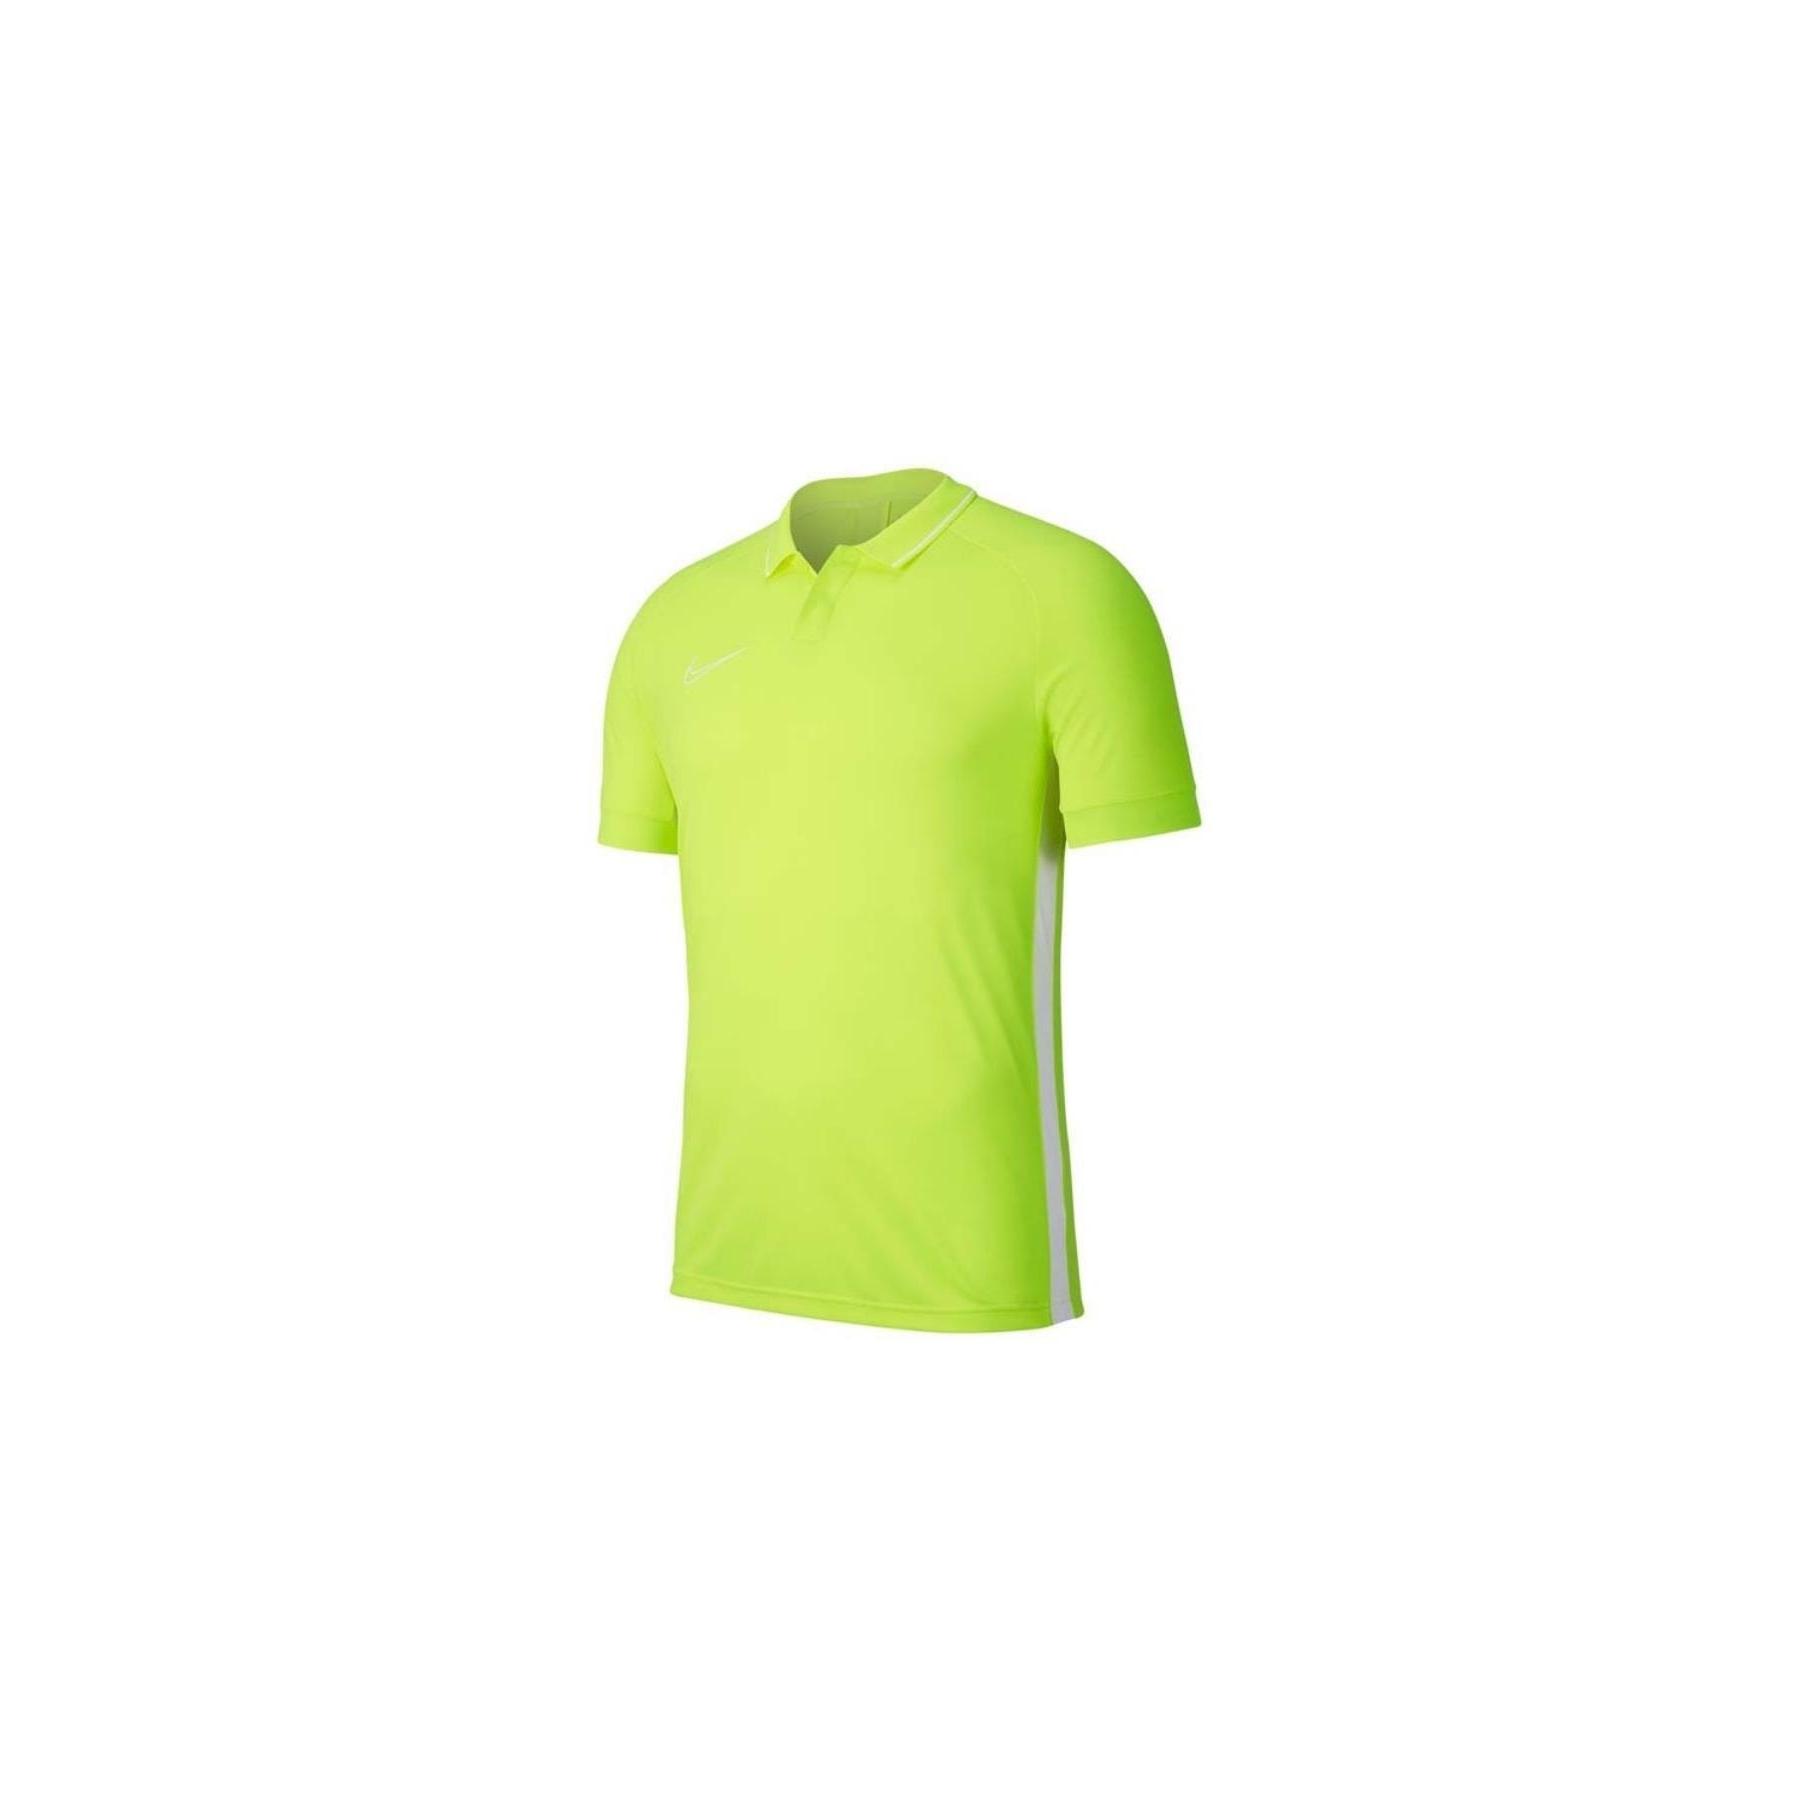 Dry Academy 19 Erkek Sarı Polo Tişört (BQ1496-702)